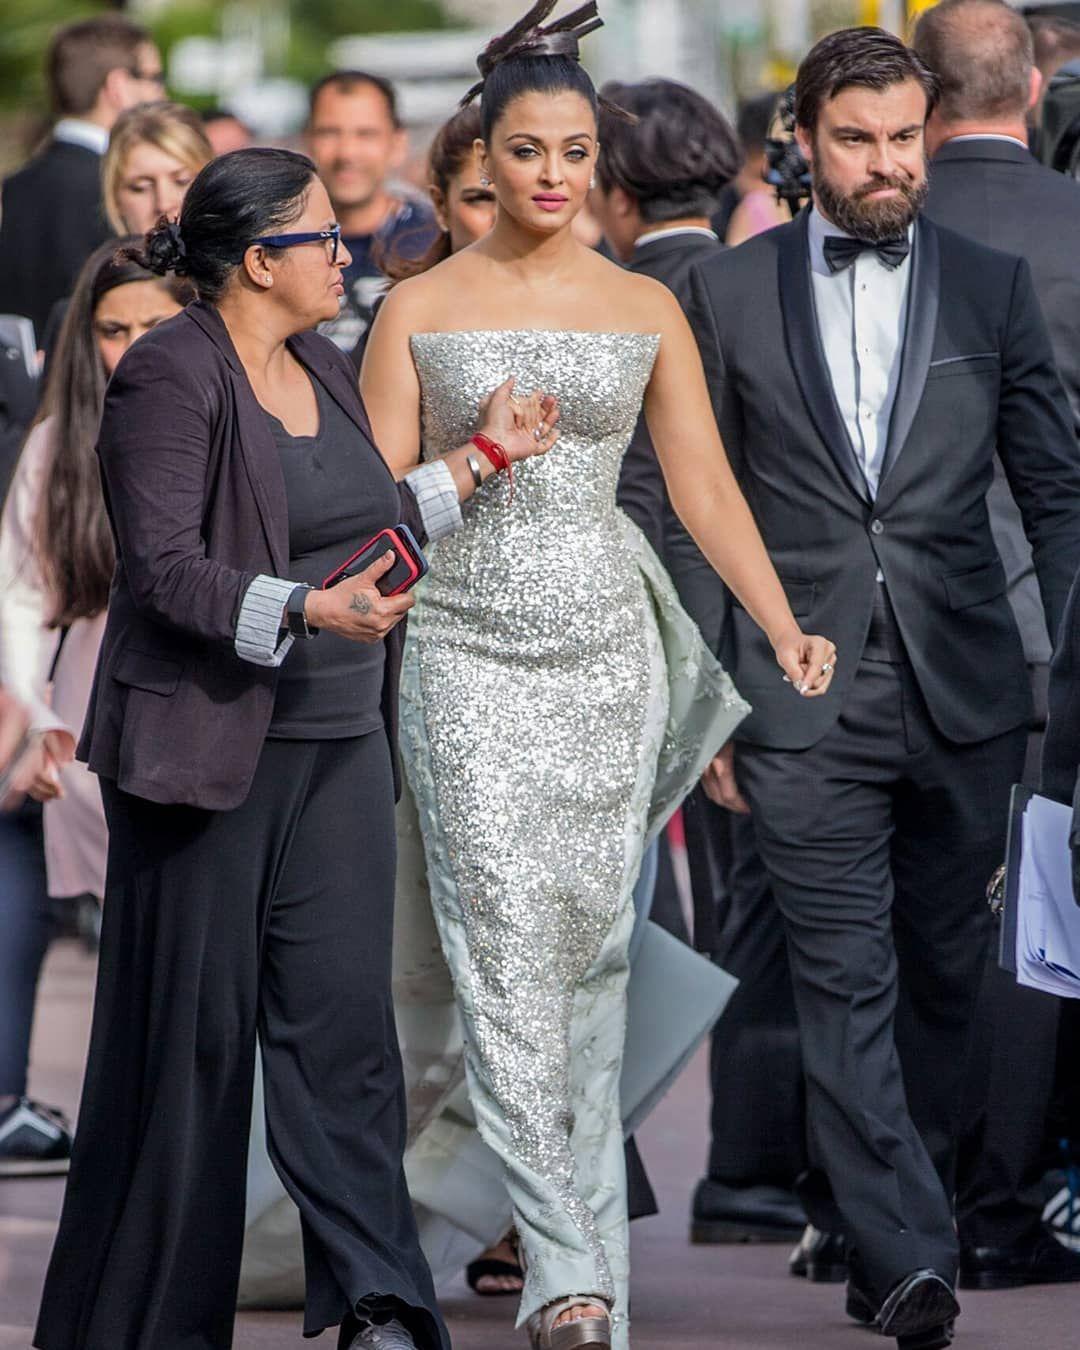 Aishwaryarulescannes Aishwaryaraibachchan Aishwaryarai Aish Bollywood Hollywood Bba Hollywood Actress Photos Bollywood Celebrities Actress Aishwarya Rai